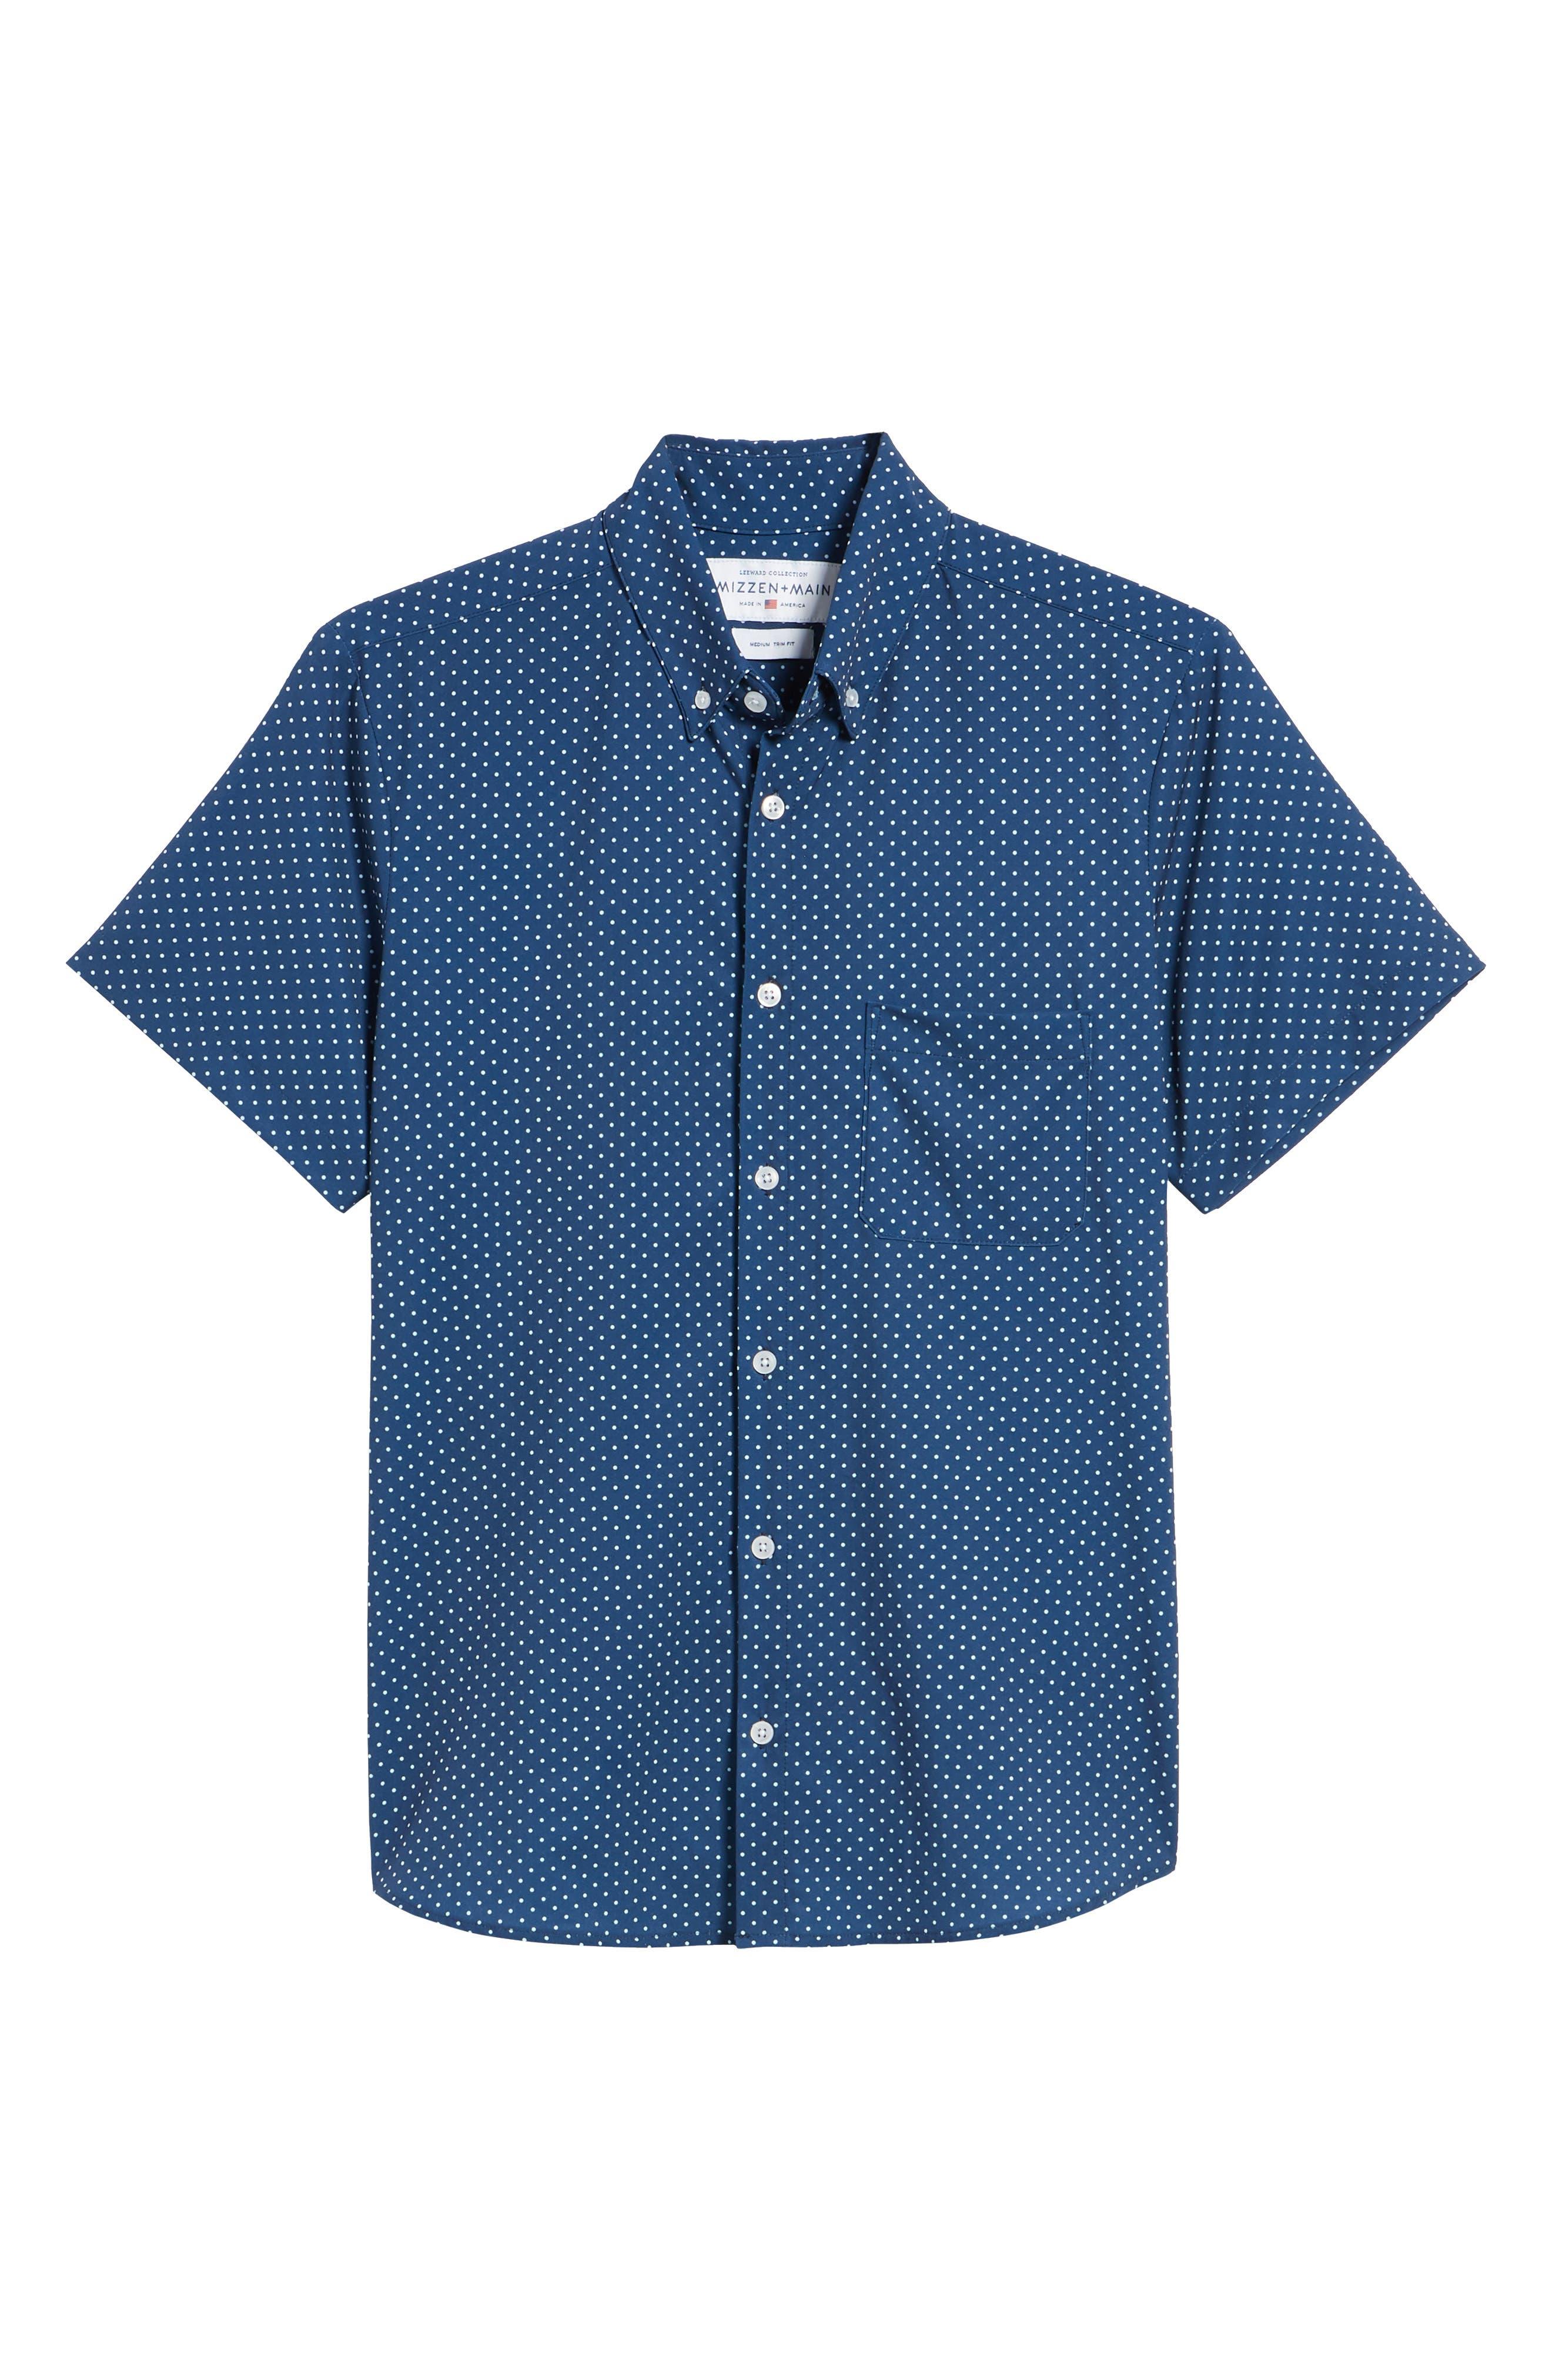 Crosby Slim Fit Dot Performance Sport Shirt,                             Alternate thumbnail 6, color,                             Navy